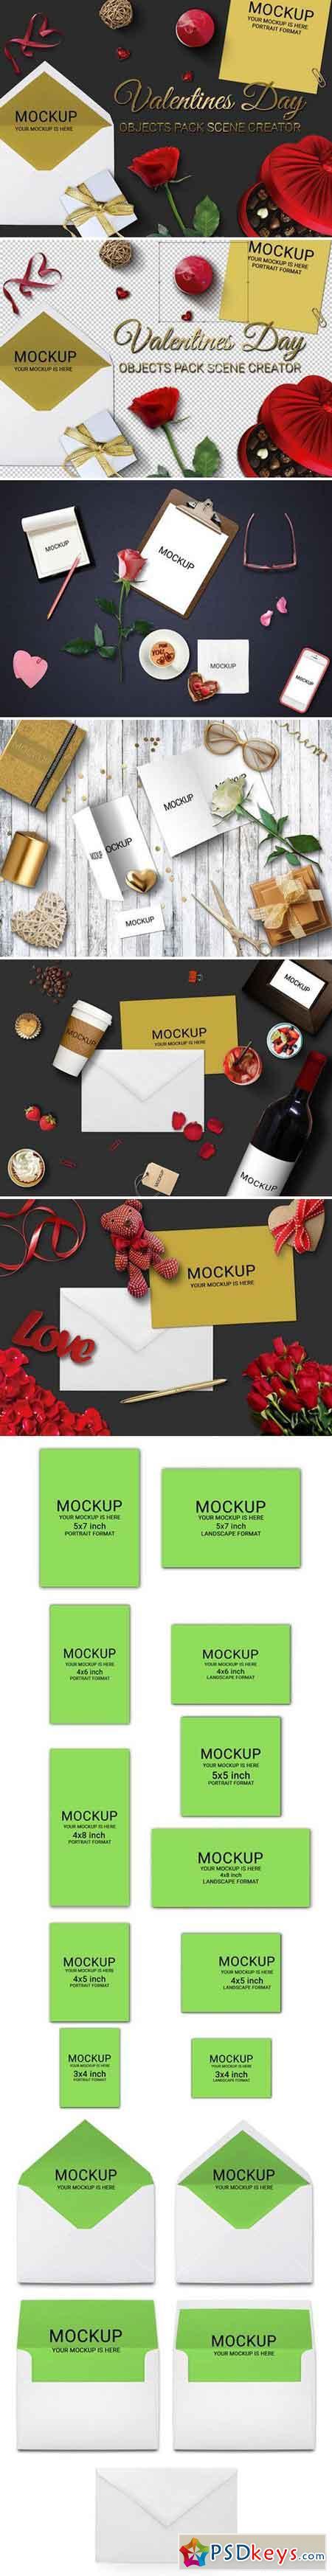 Valentines Day Scene Creator MockUp 2257426